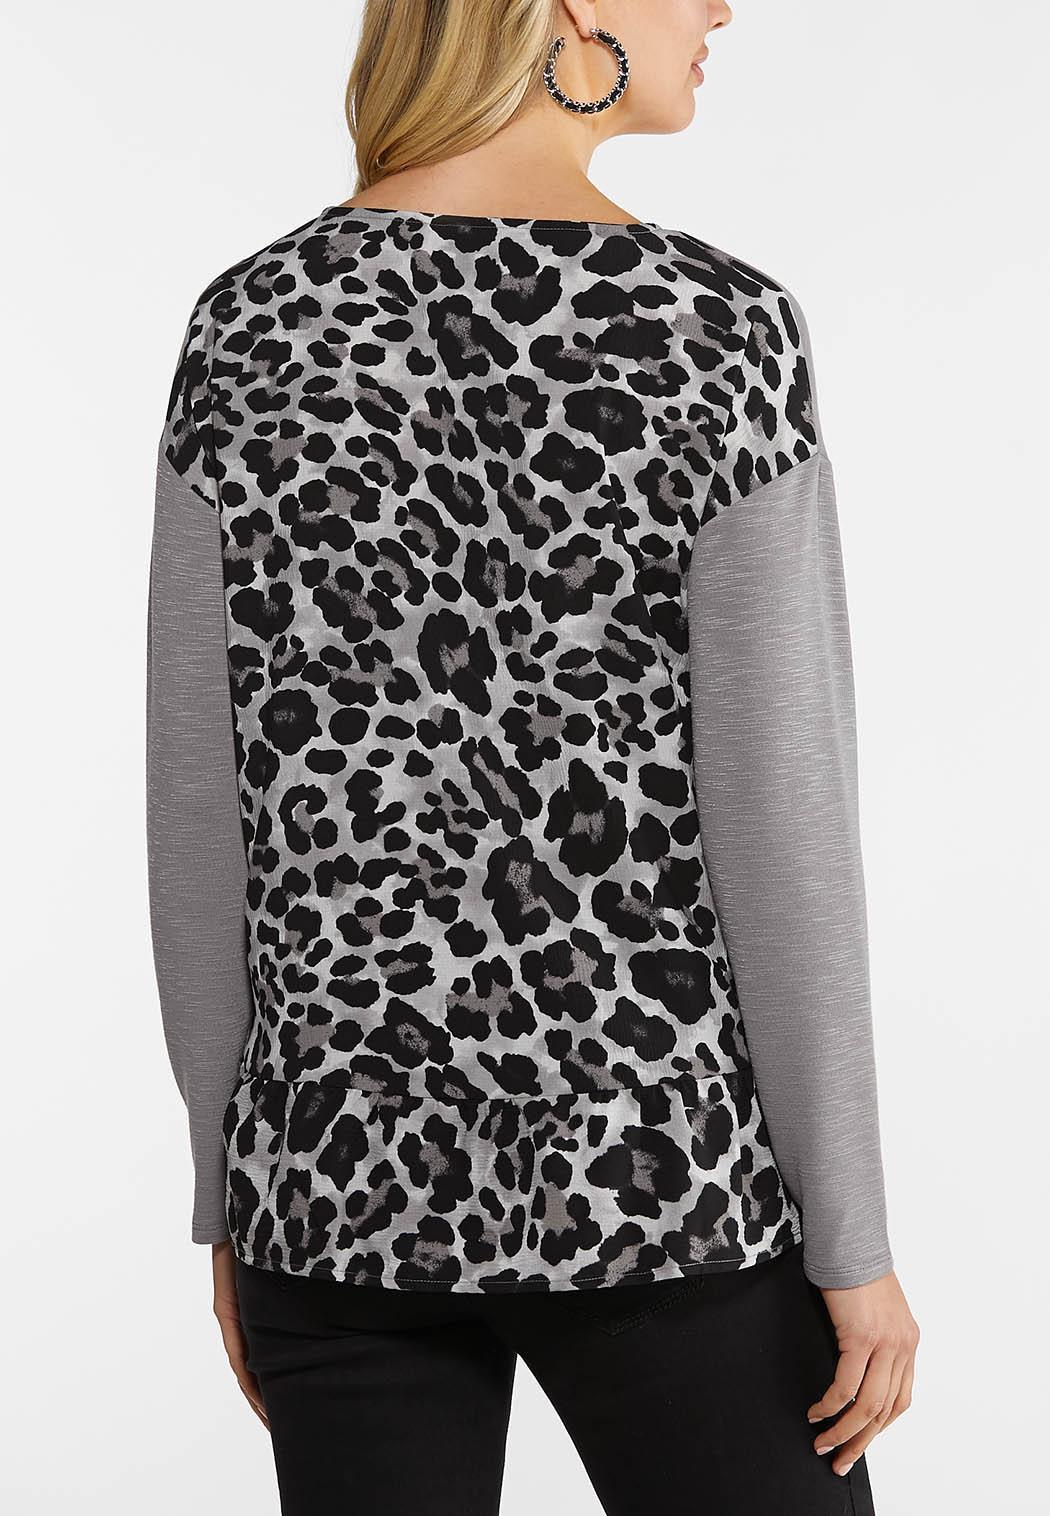 Leopard Back top (Item #44089103)